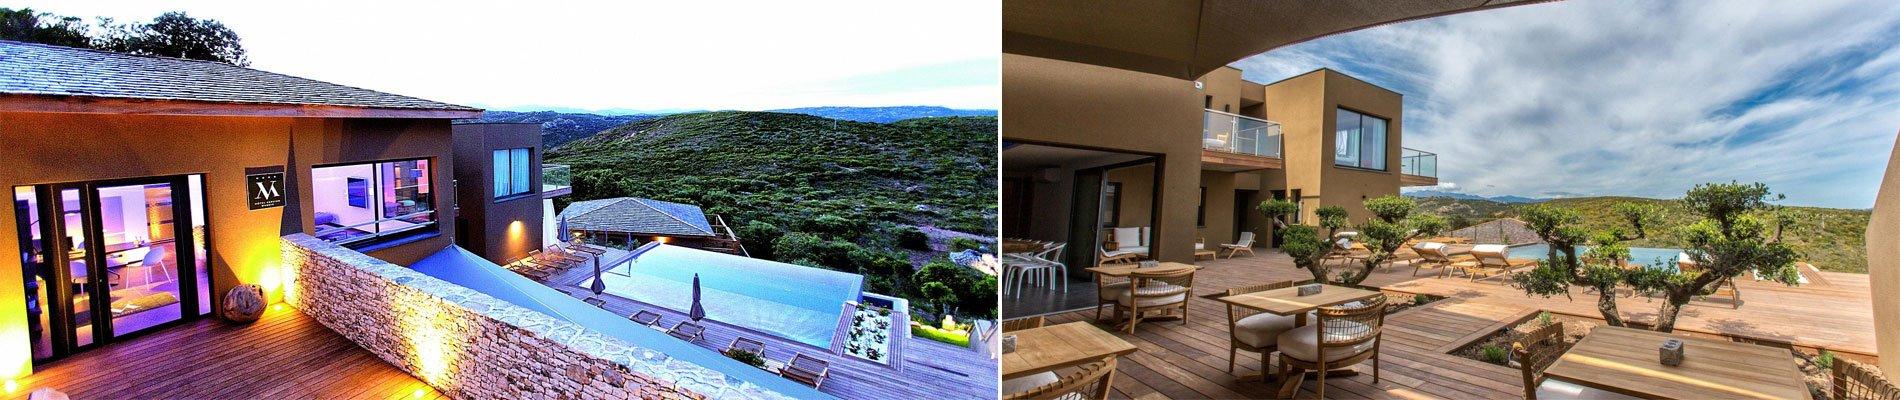 hotel-santa-manza-version-maquis-corsica-reizen